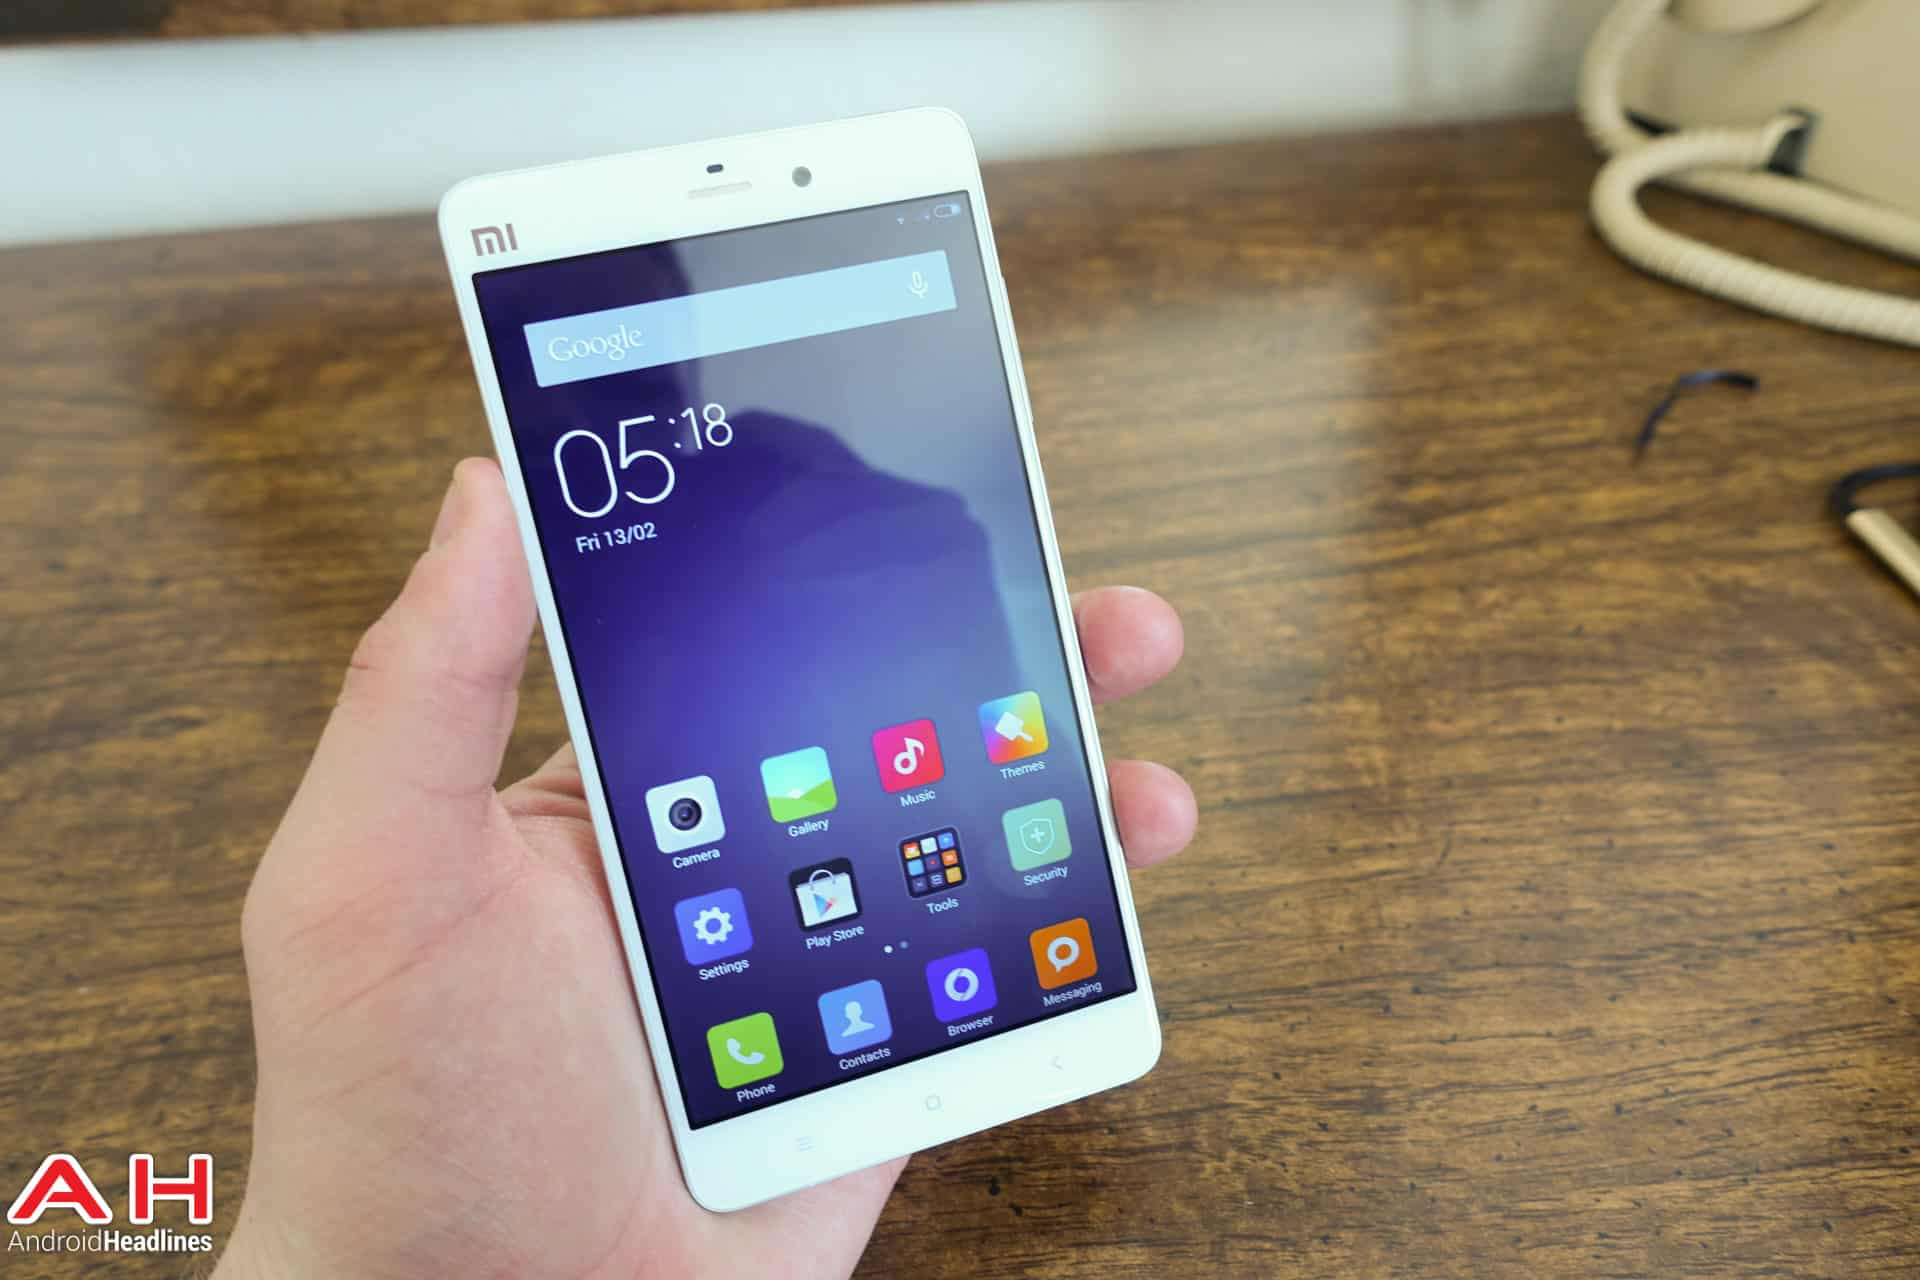 Xiaomi Mi Note AH 03766